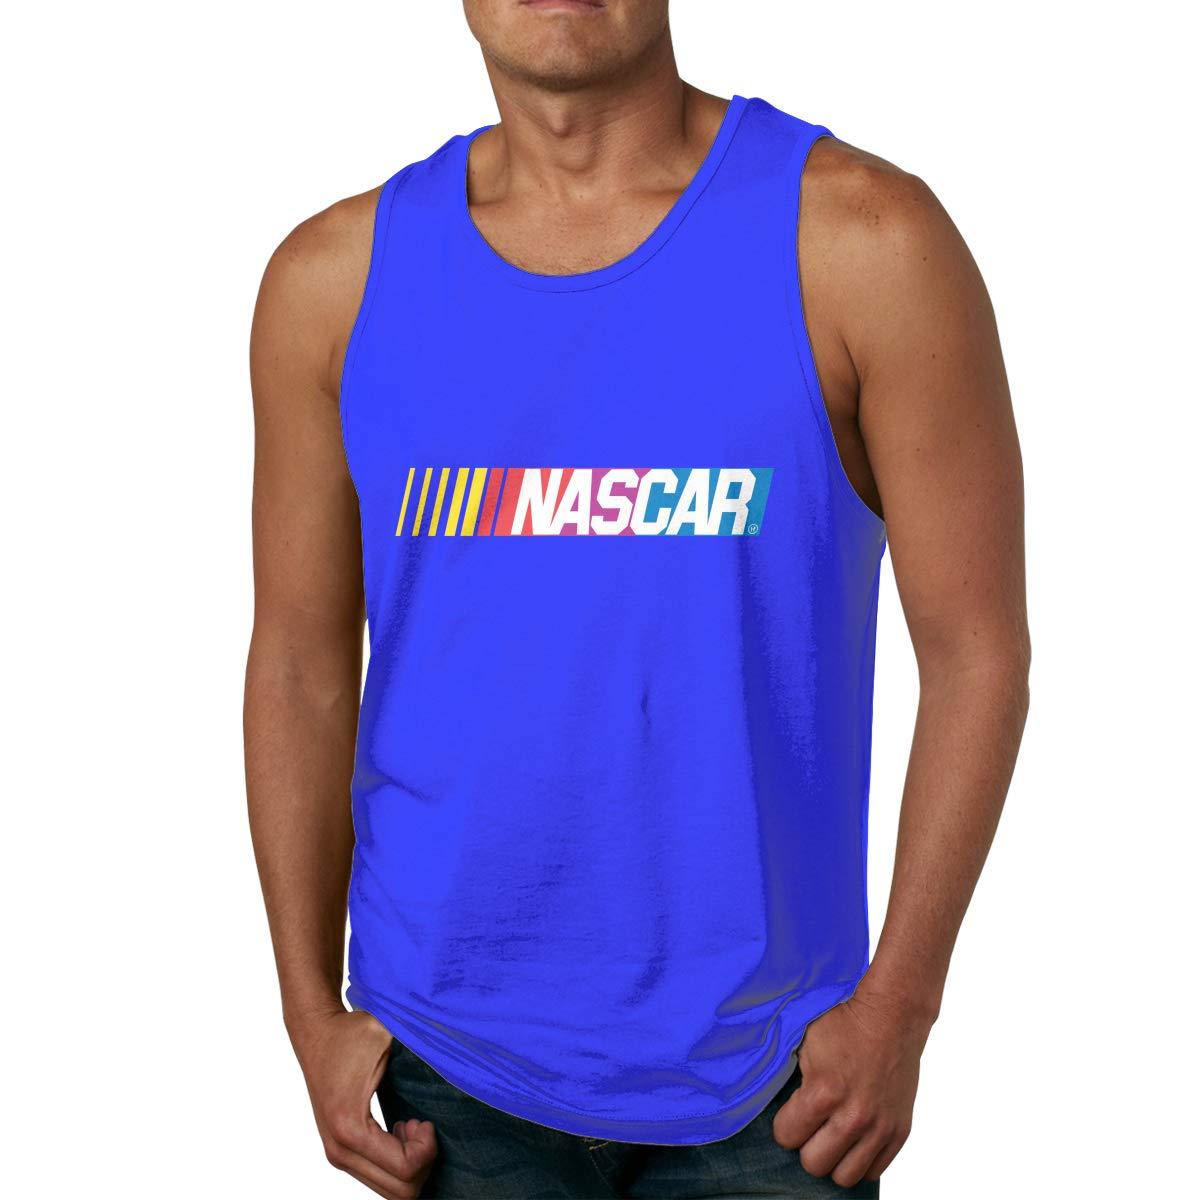 ugyly Men's NASCAR - Logo Basic Shirts Summer T Shirt Sleeveless T-Shirt Round Neck Cotton Sport Tank Tops Blue 29